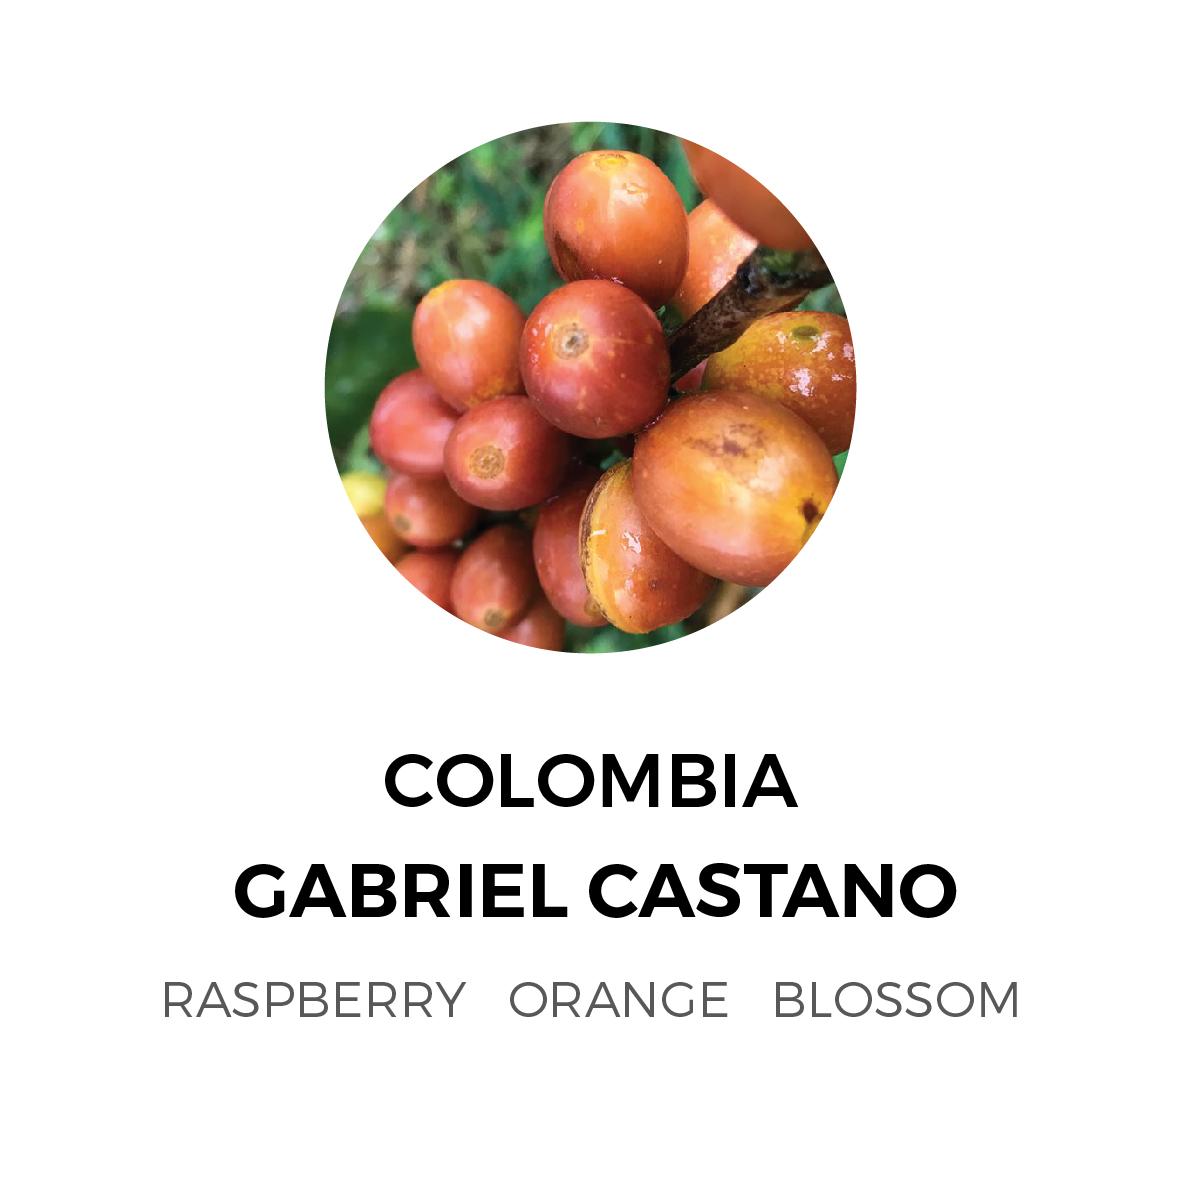 Colombia-Gabriel-Castano-01-01.jpg